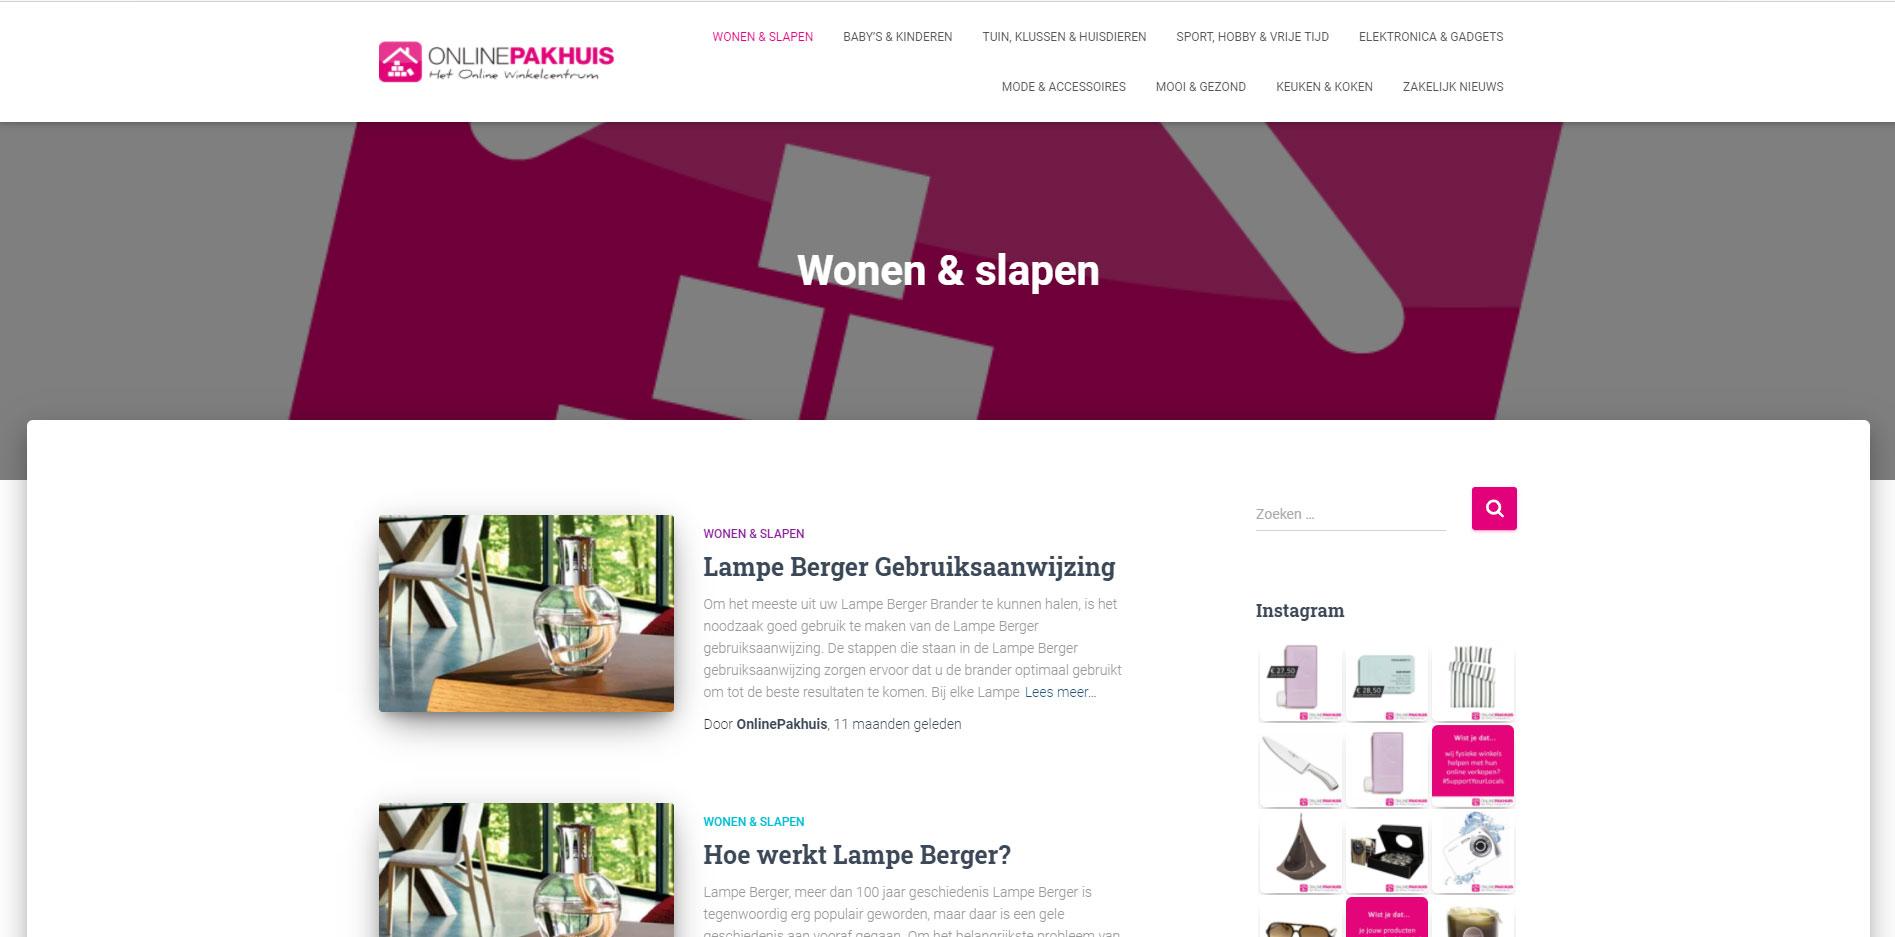 OnlinePakhuis Blog